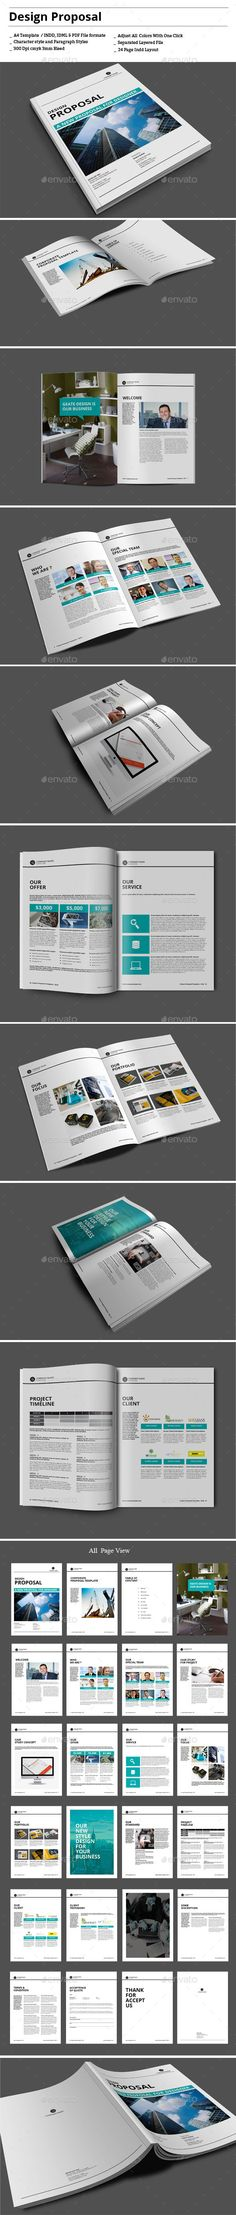 Design Proposal Template | Download: http://graphicriver.net/item/design-proposal/9207308?ref=ksioks